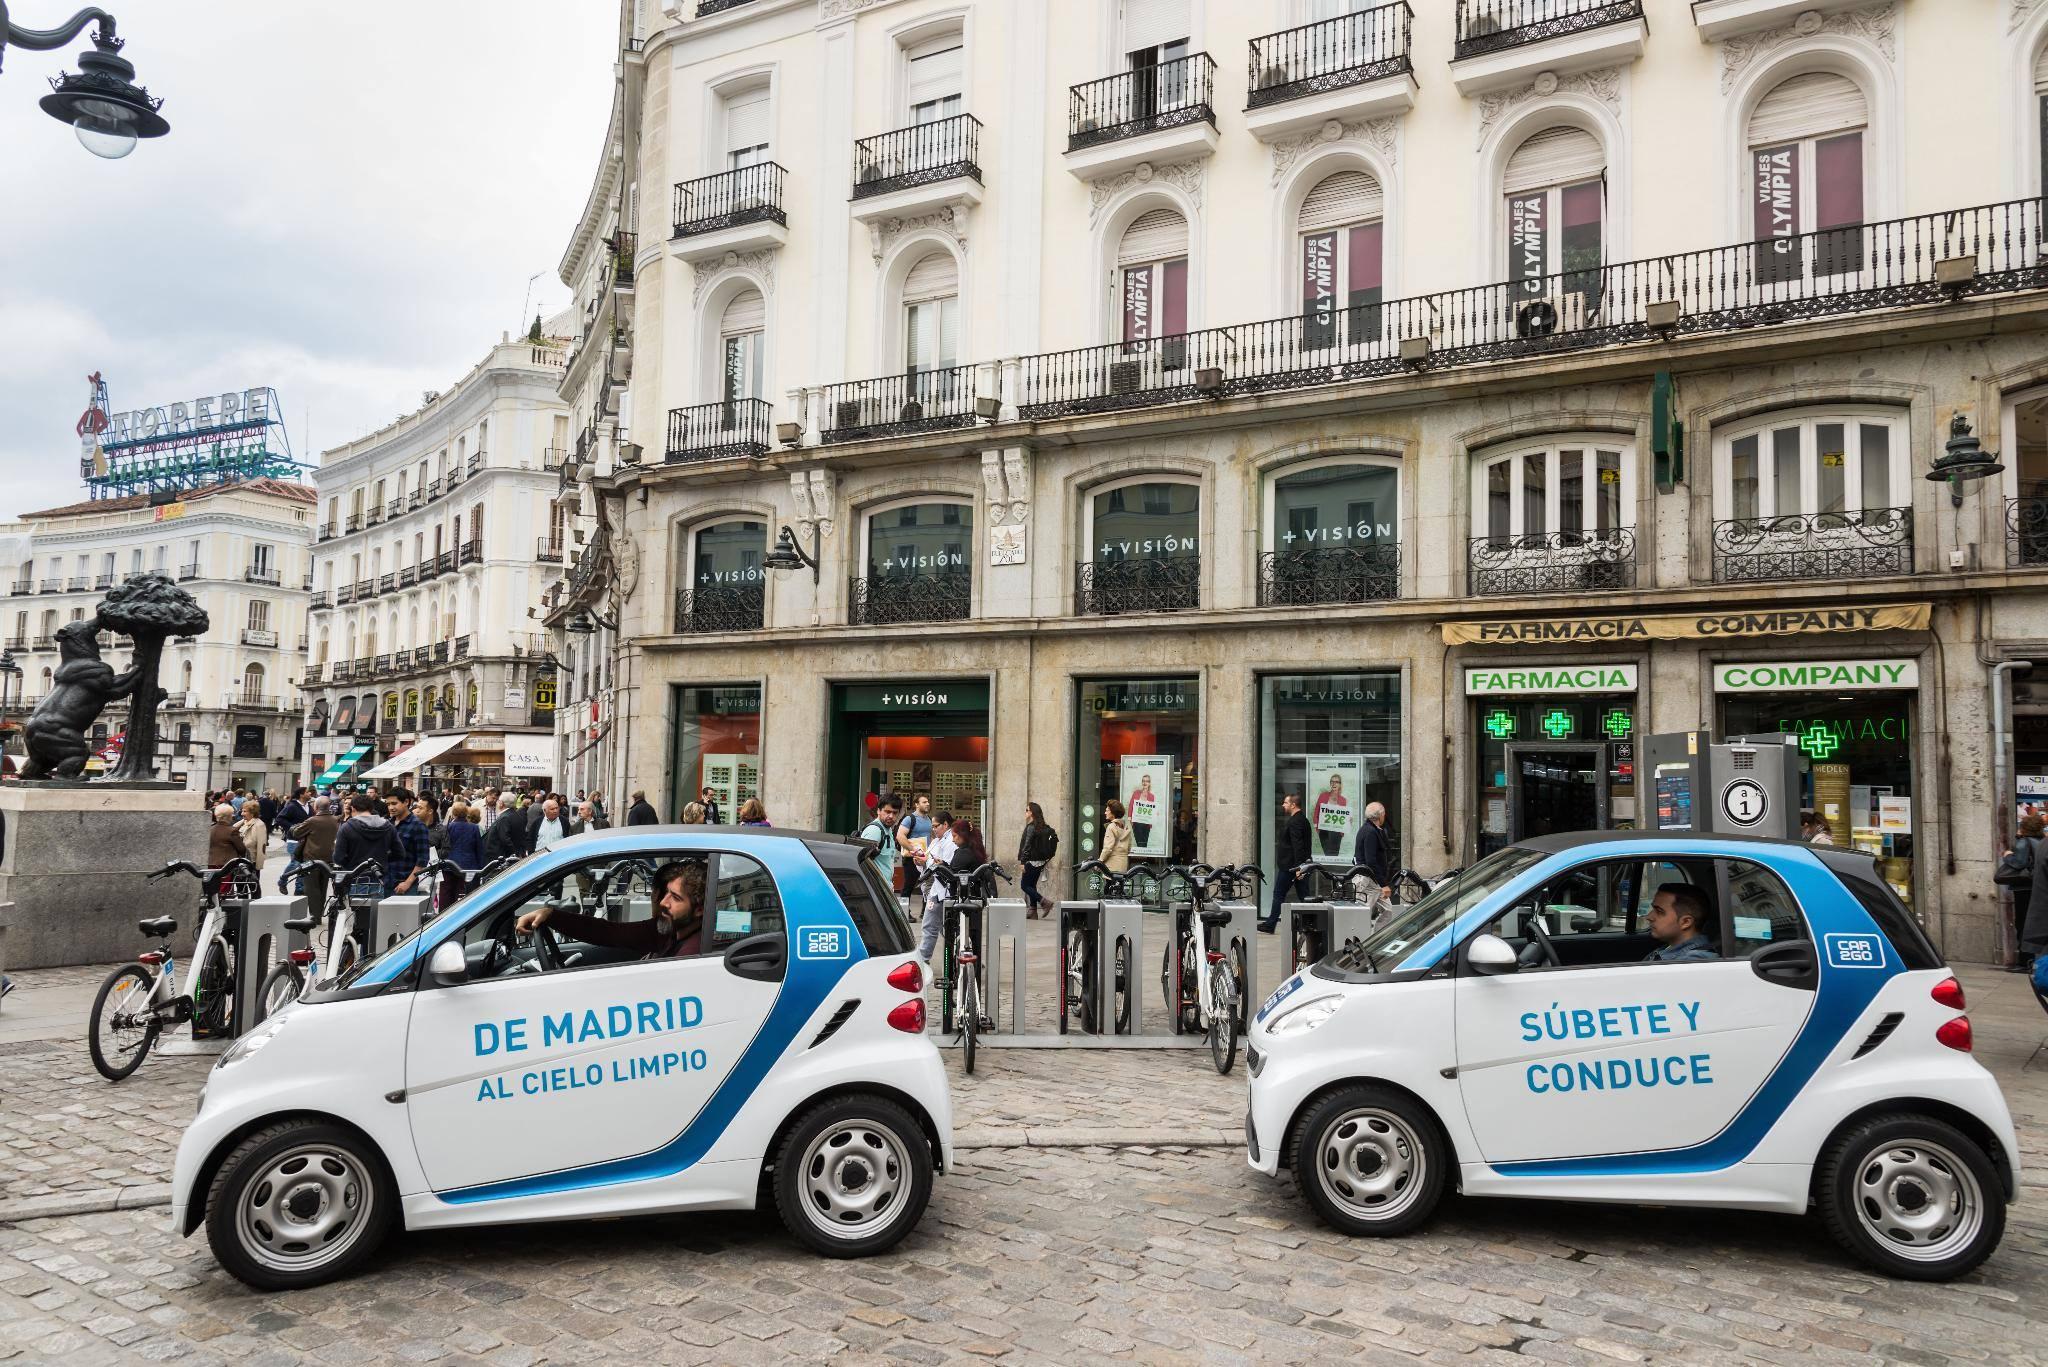 movilidad-urbana-sostenibilidad-coche-electrico-compartido-ECOVIDRIO